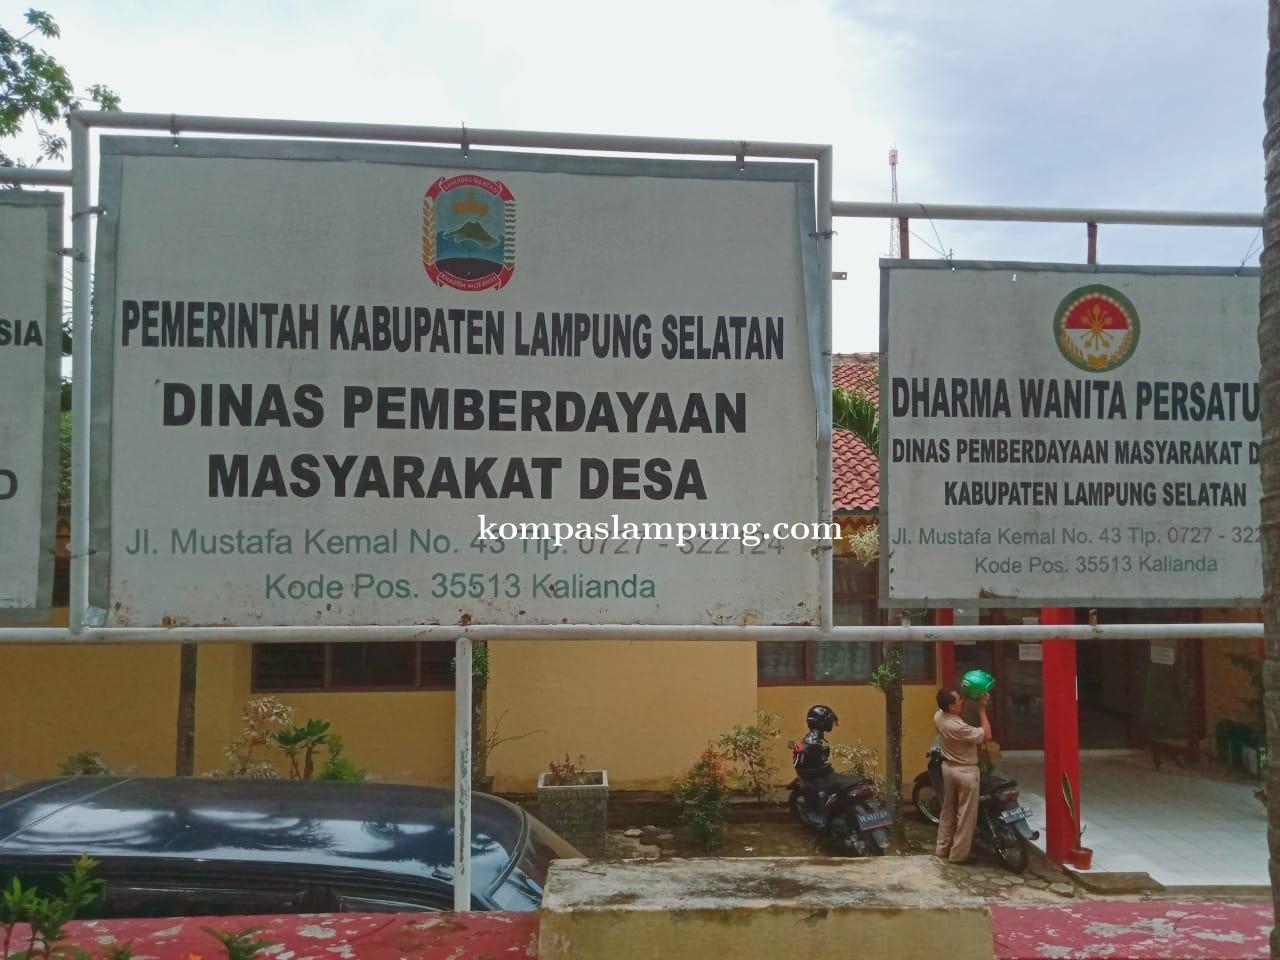 Ada Penolakan Oleh 4 Calon, Biaya Pilkades Desa Tanjung Baru Yang Fantastis Terus Menuai Kritikan